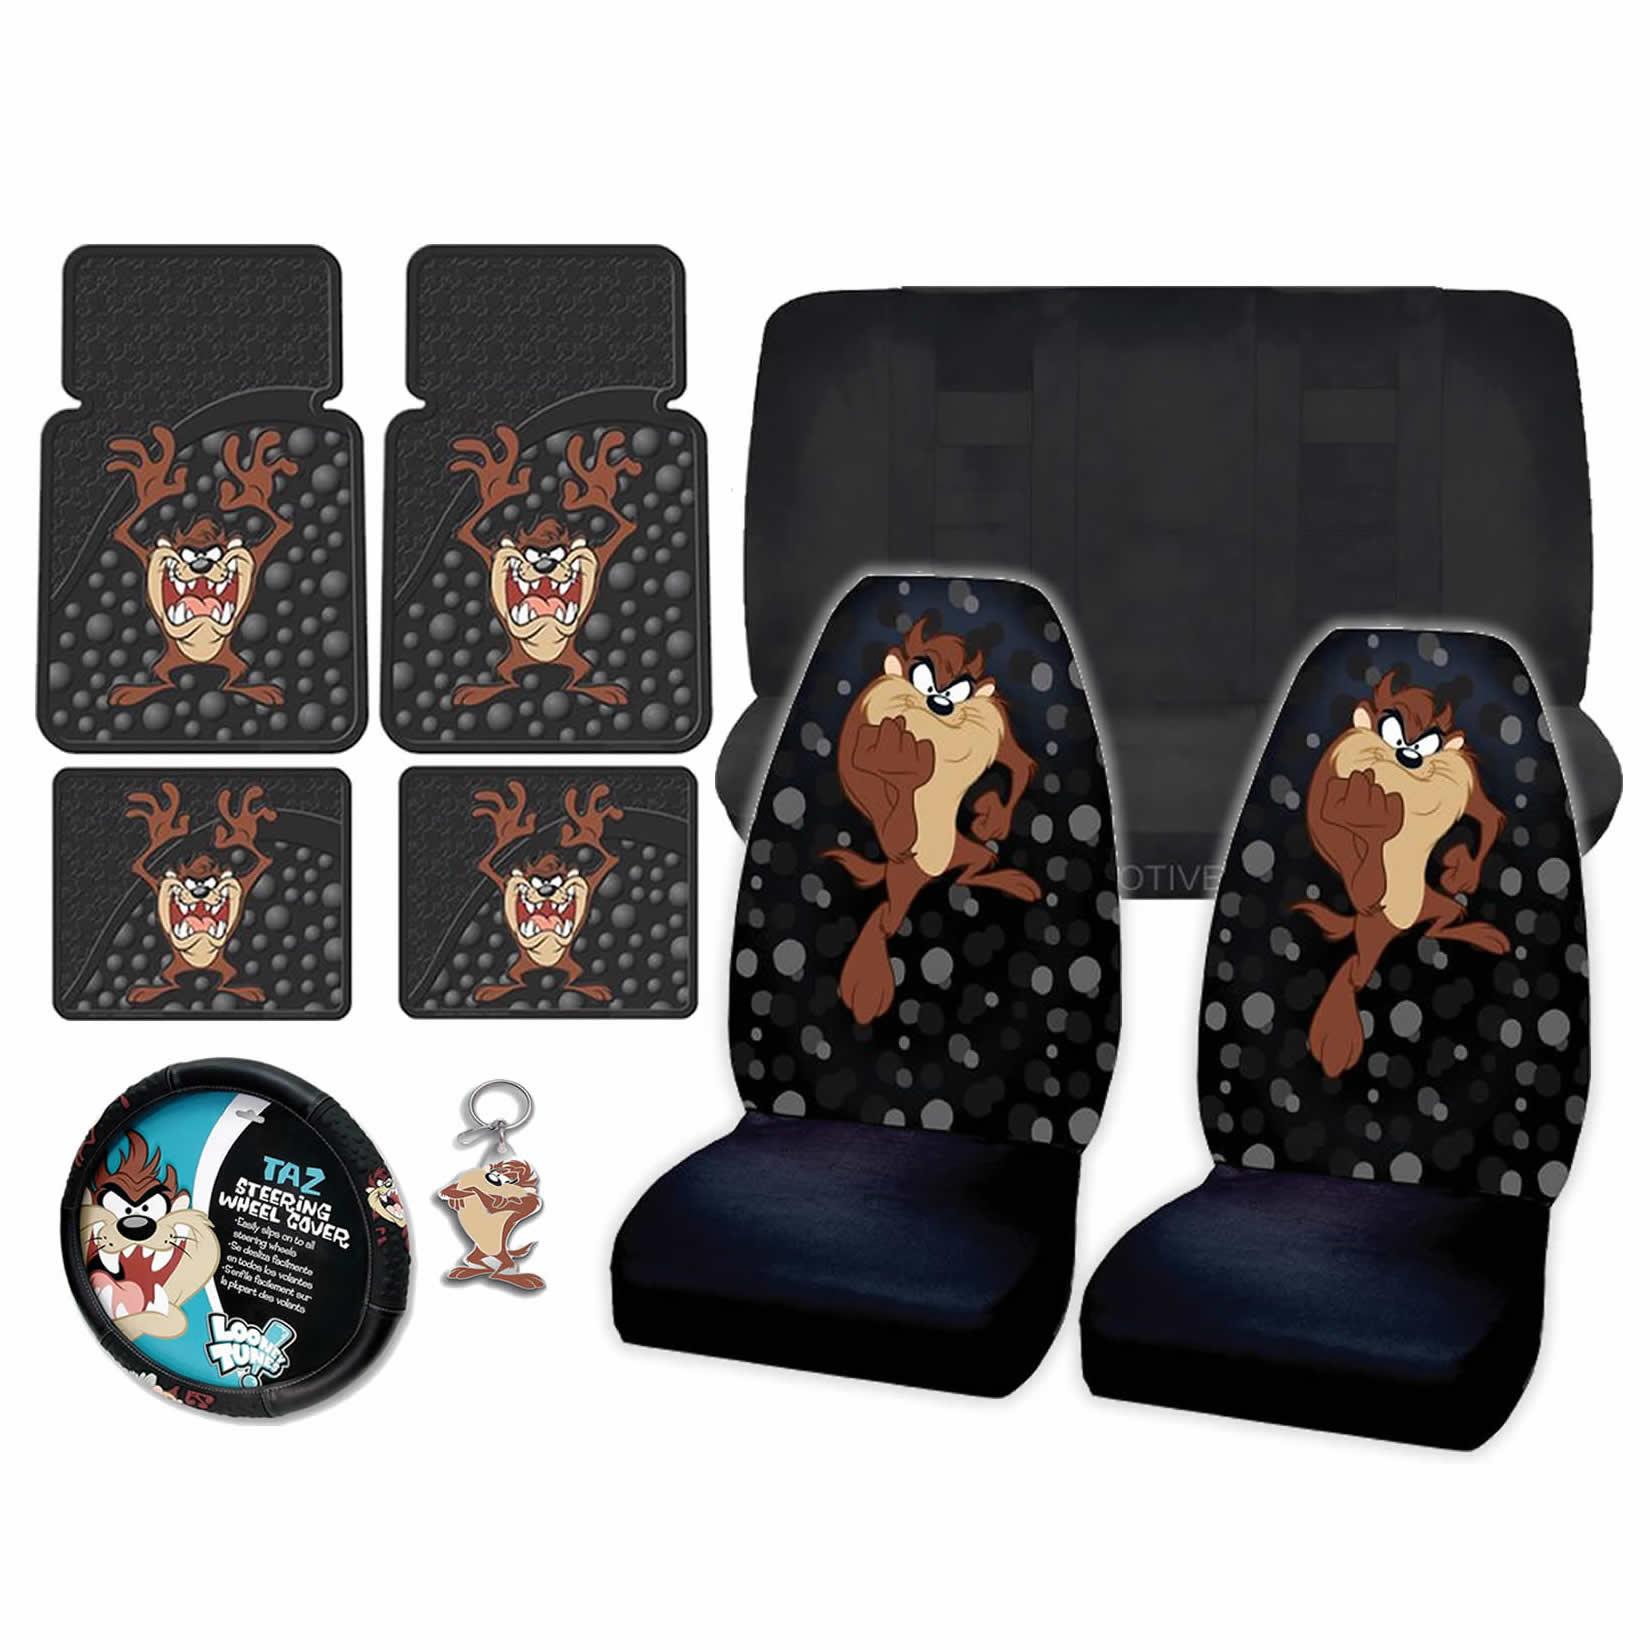 10pc Looney Tunes Taz Attitude Black Seat Covers Rubber